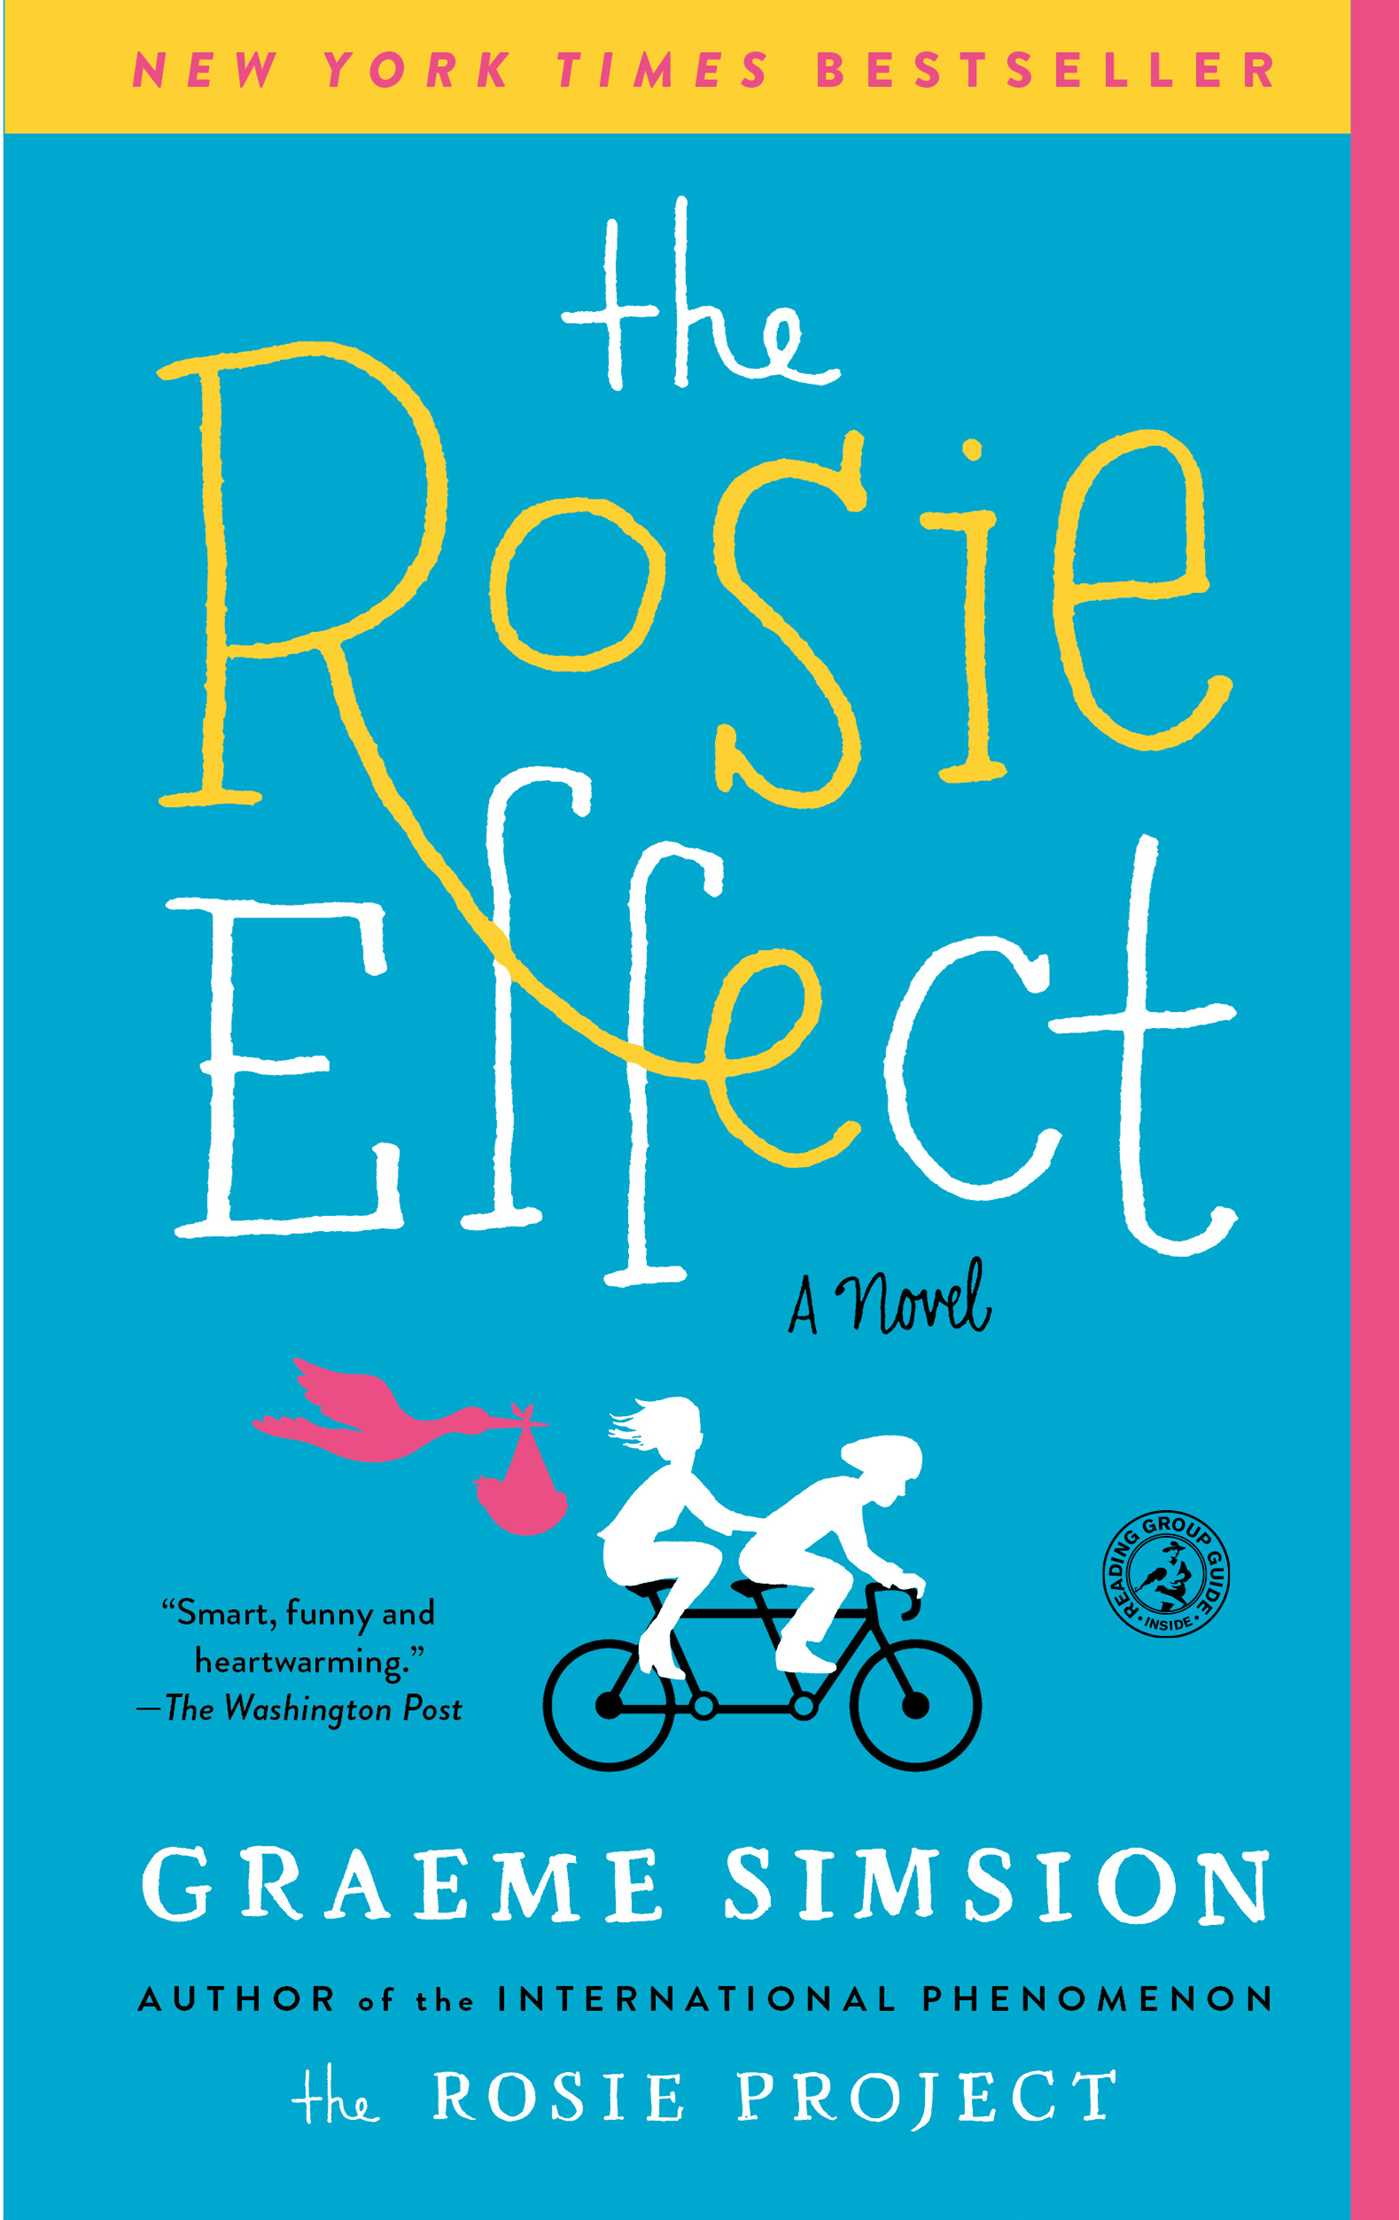 The Rosie Effect A Novel